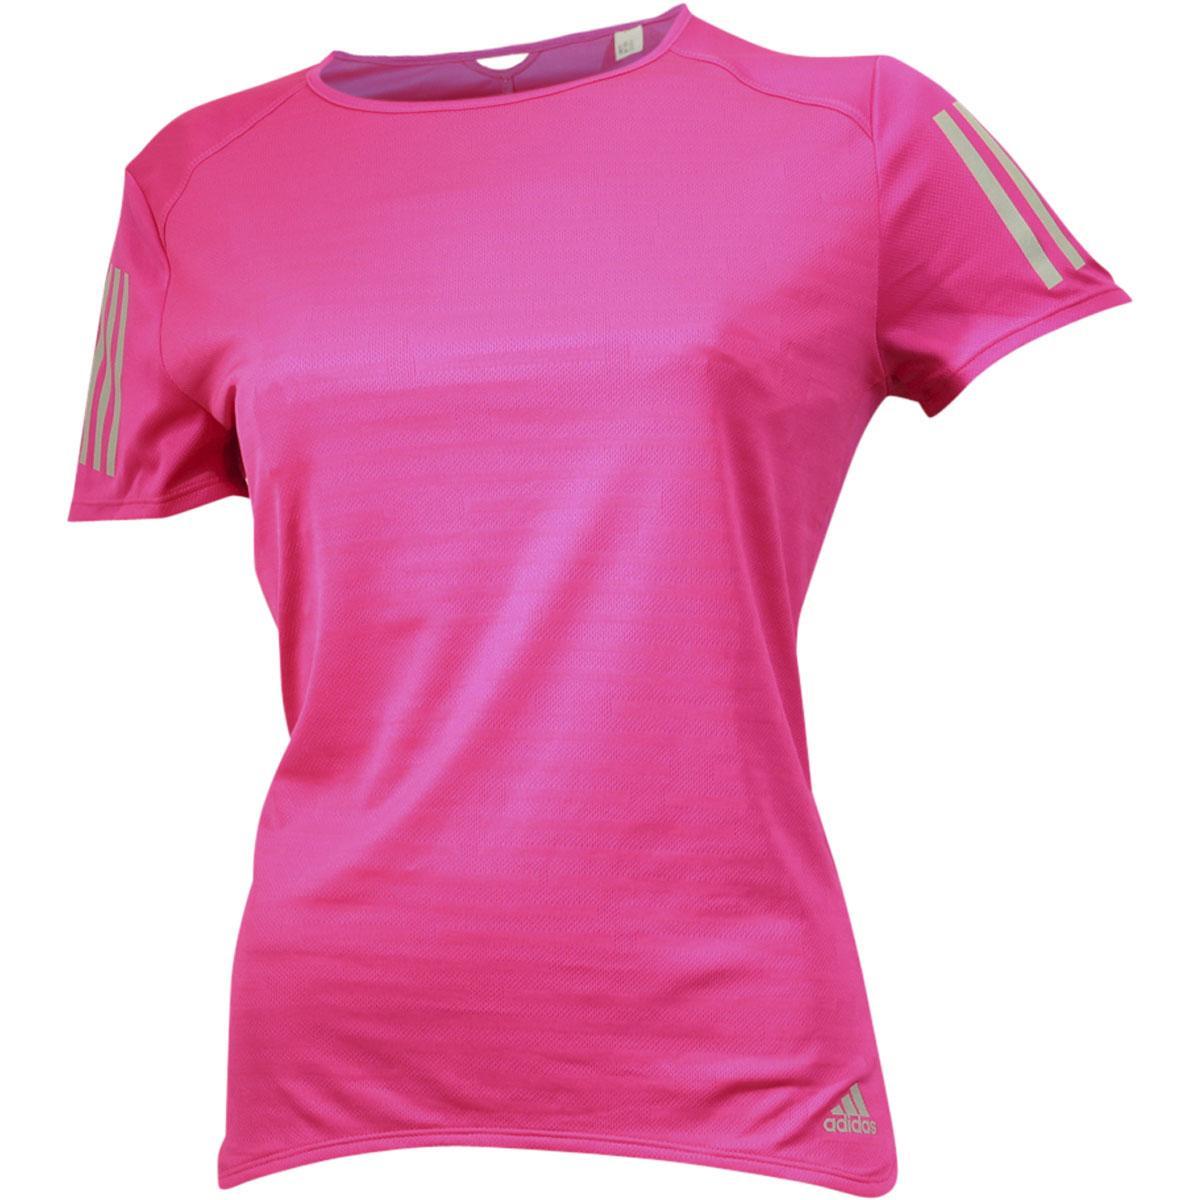 4d7b0d4eb701 Adidas Women's Response Trail Running Climacool Short Sleeve T-Shirt